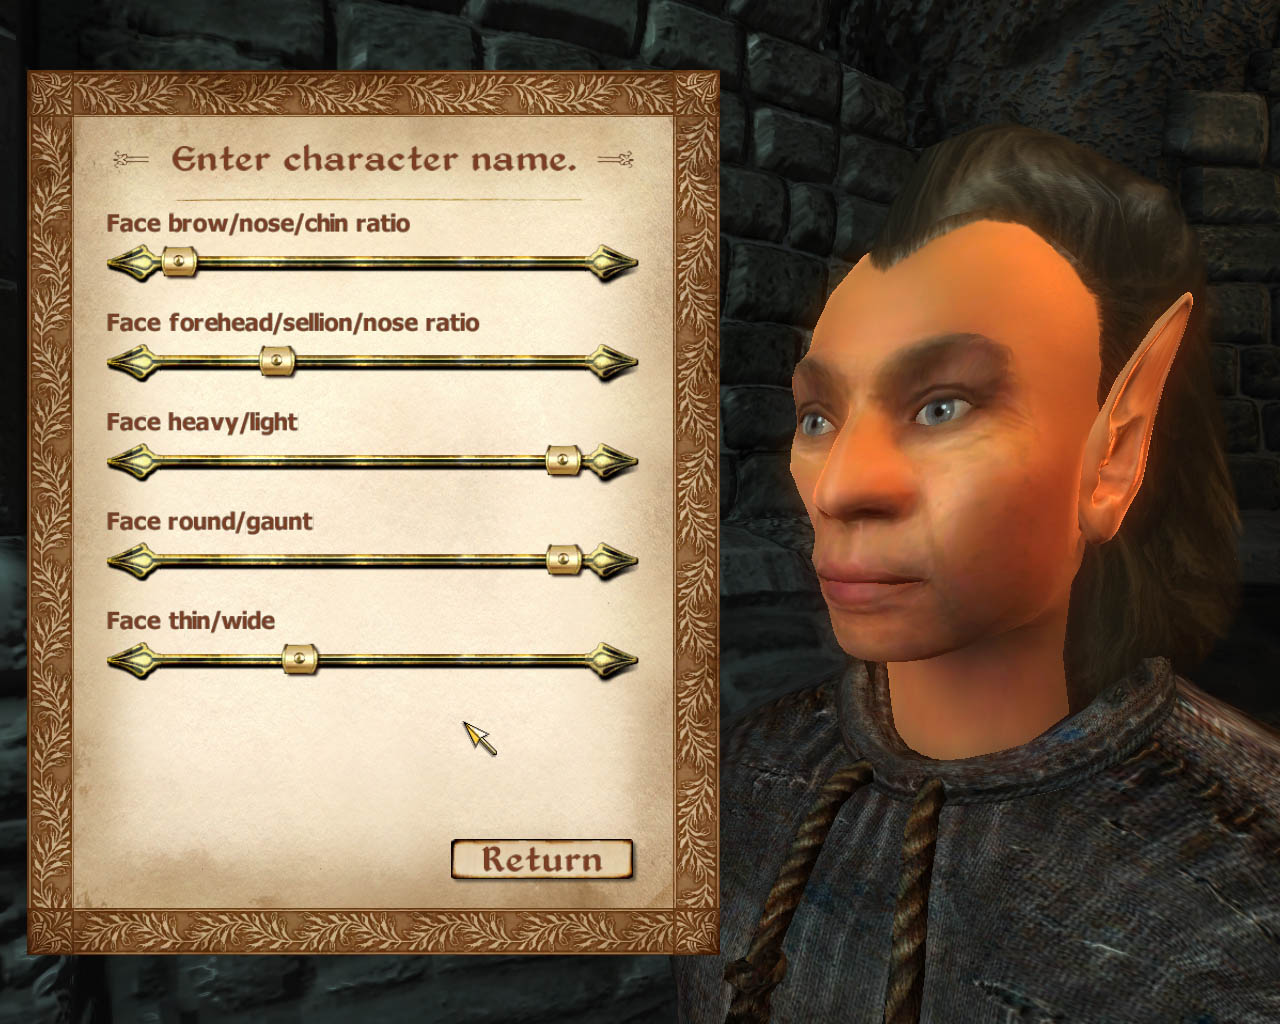 Super Adventures in Gaming: The Elder Scrolls IV: Oblivion (PC)